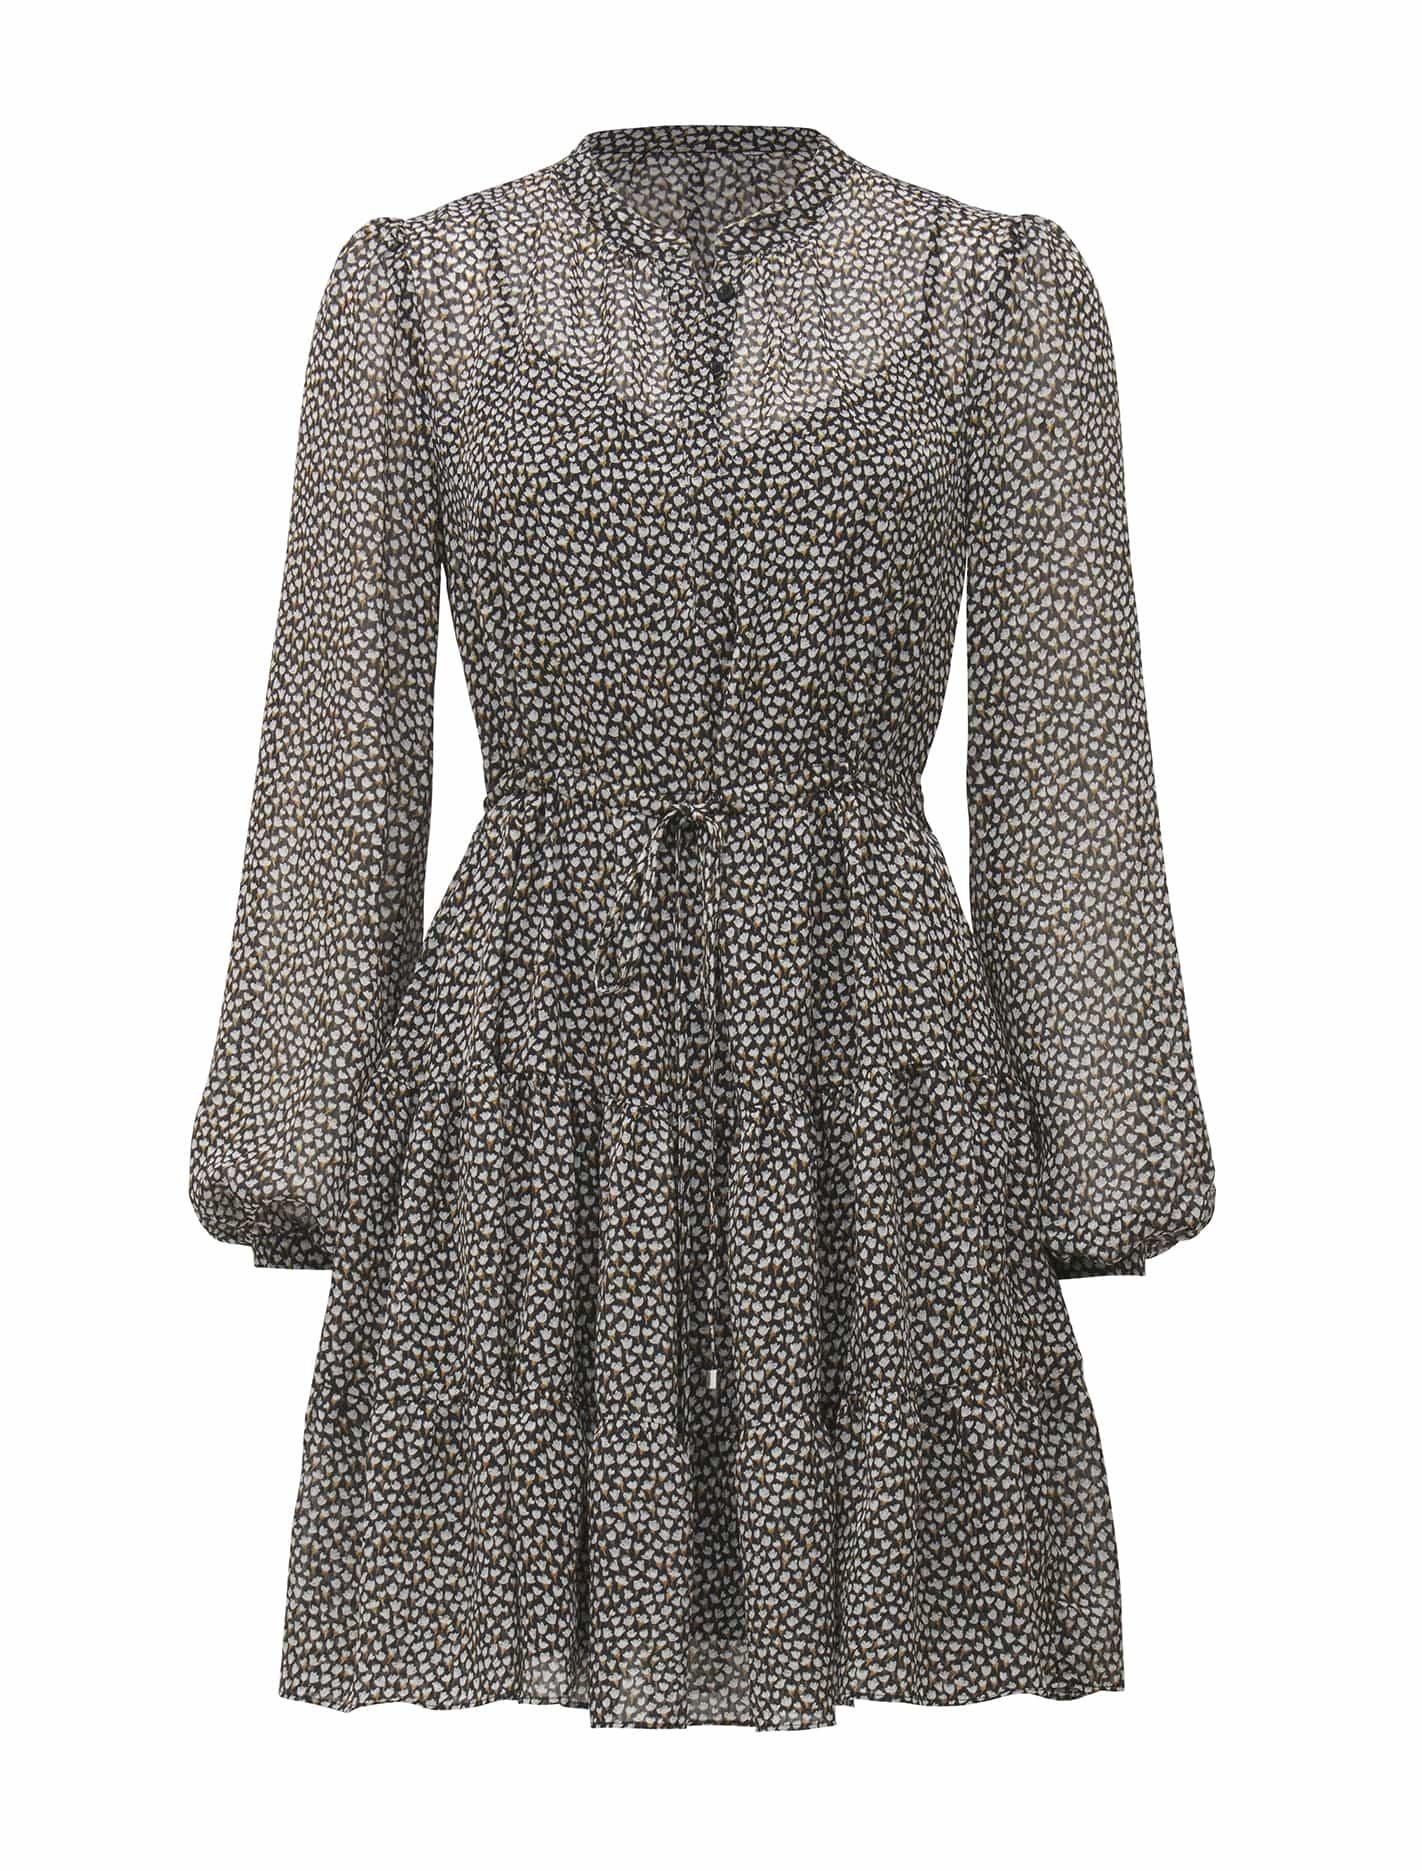 Irene Smock Dress